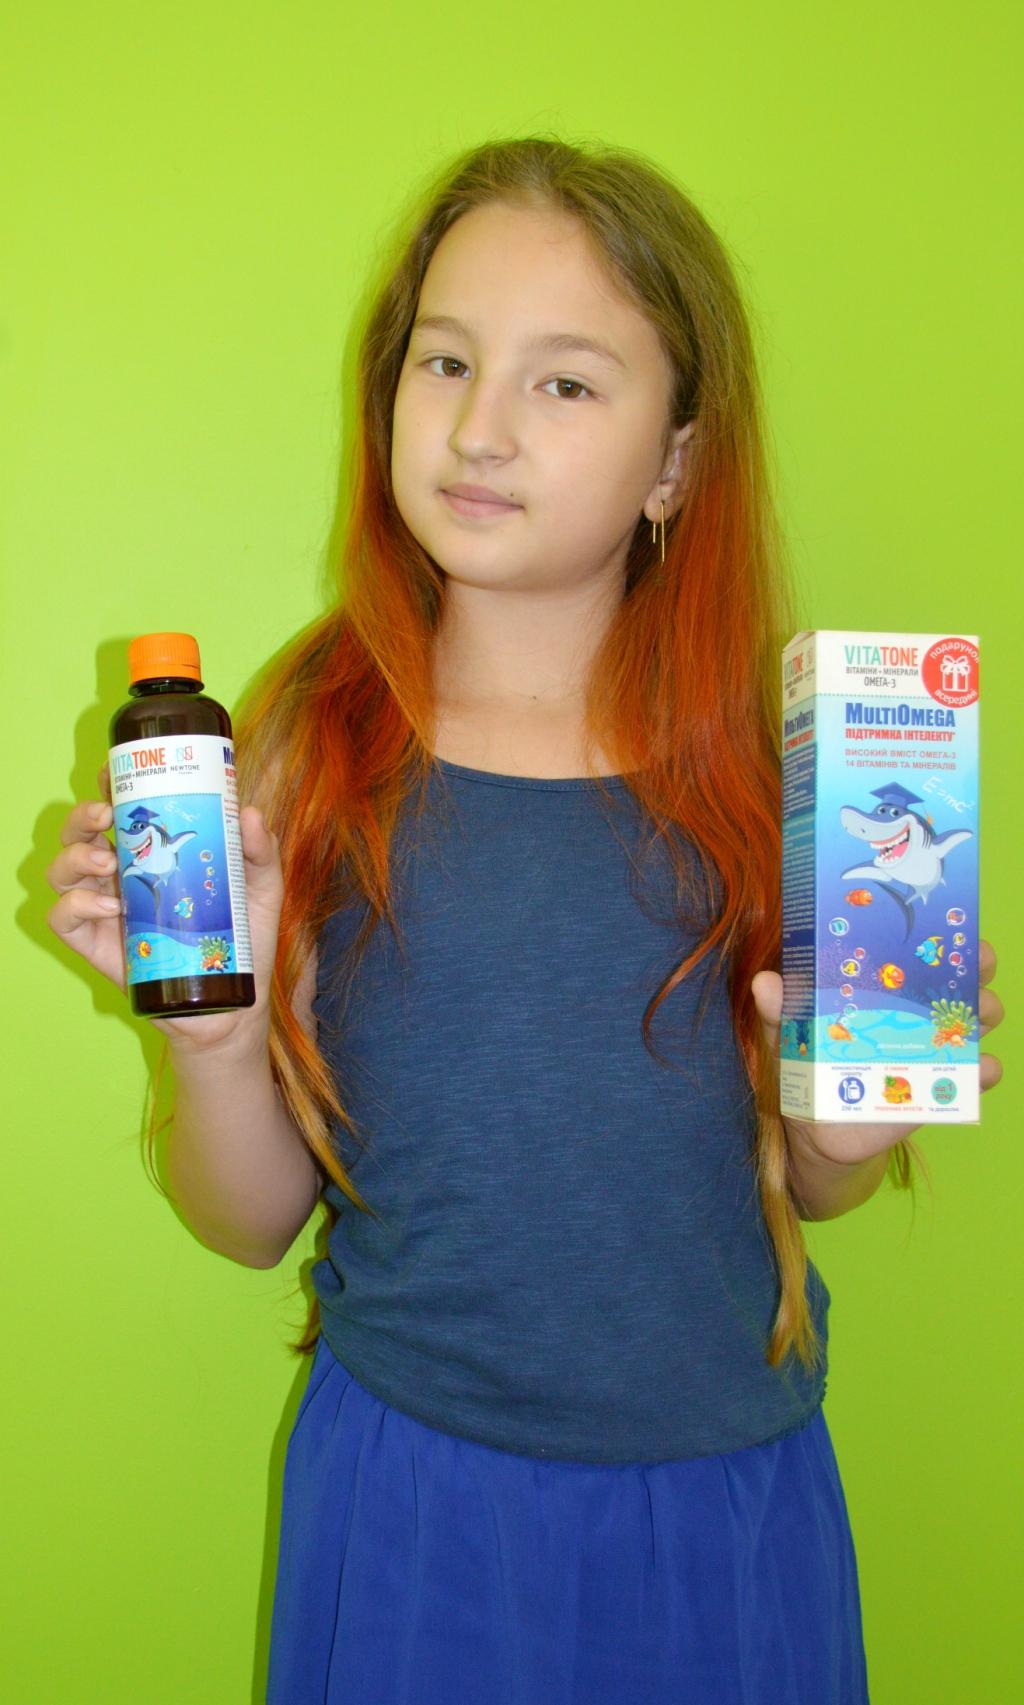 VitaTone витамины для детей с комплексом Омега-3 - Витамины для детей Vitatone с комплексом Омега-3